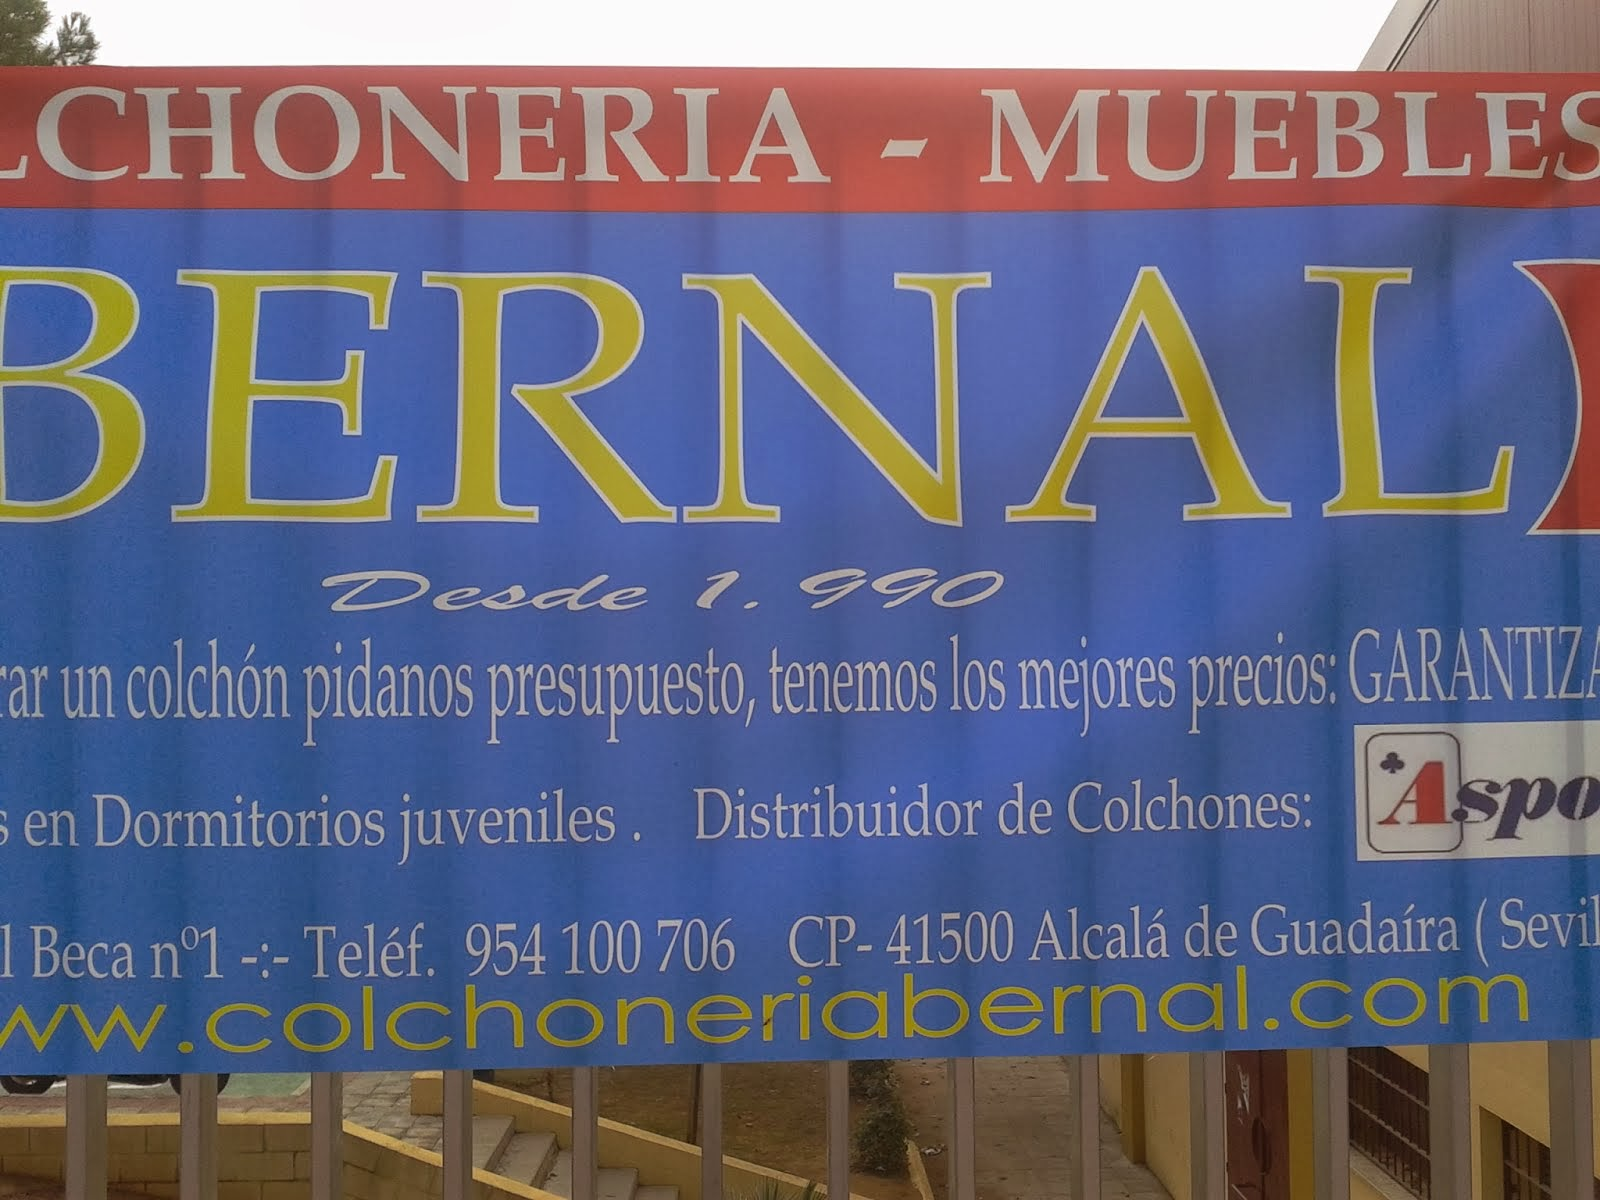 Colchoneria BERNAL